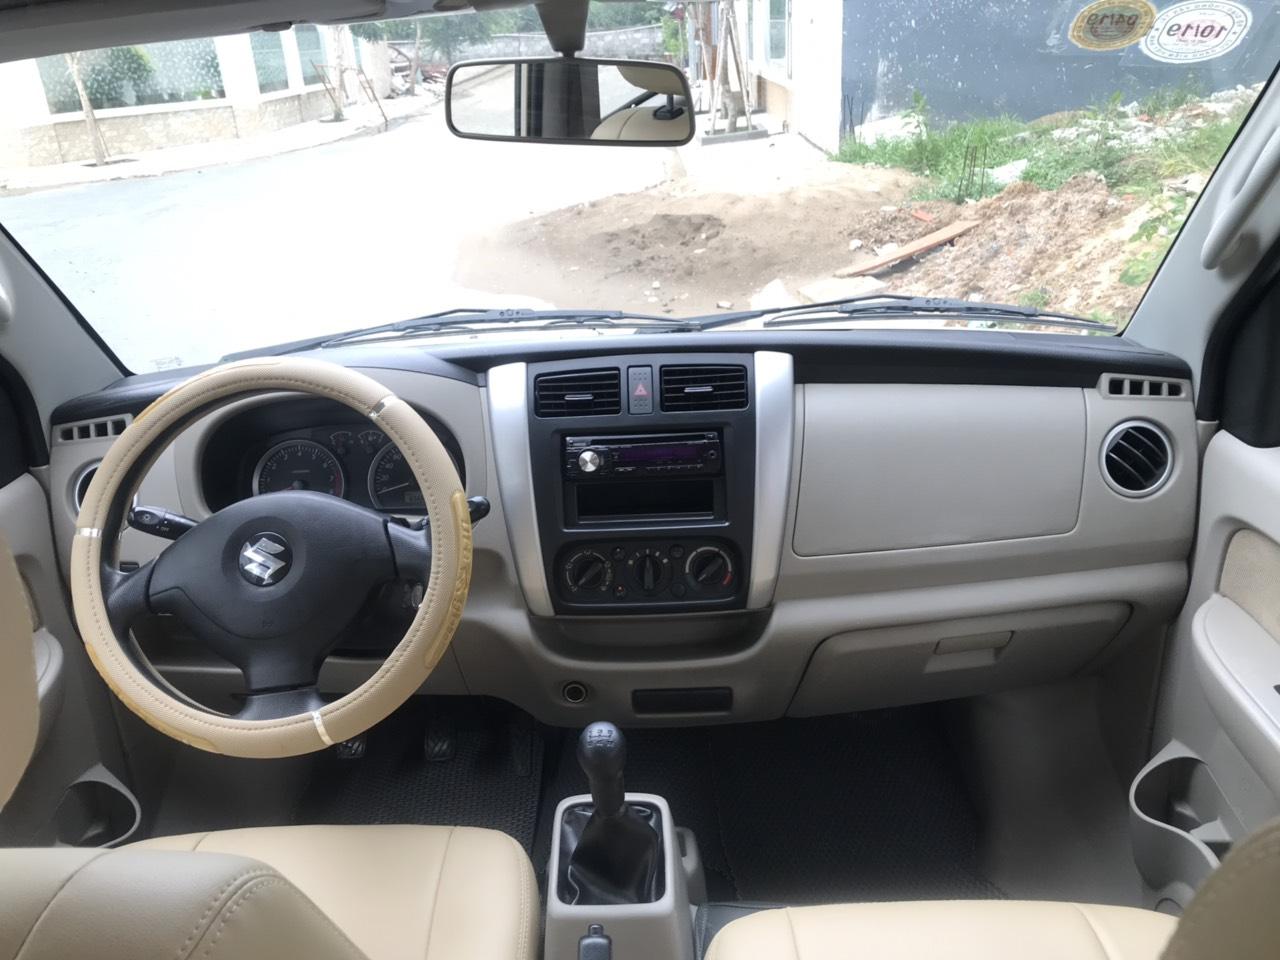 Cần bán gấp Suzuki APV GL đời 2011, màu kem (be)